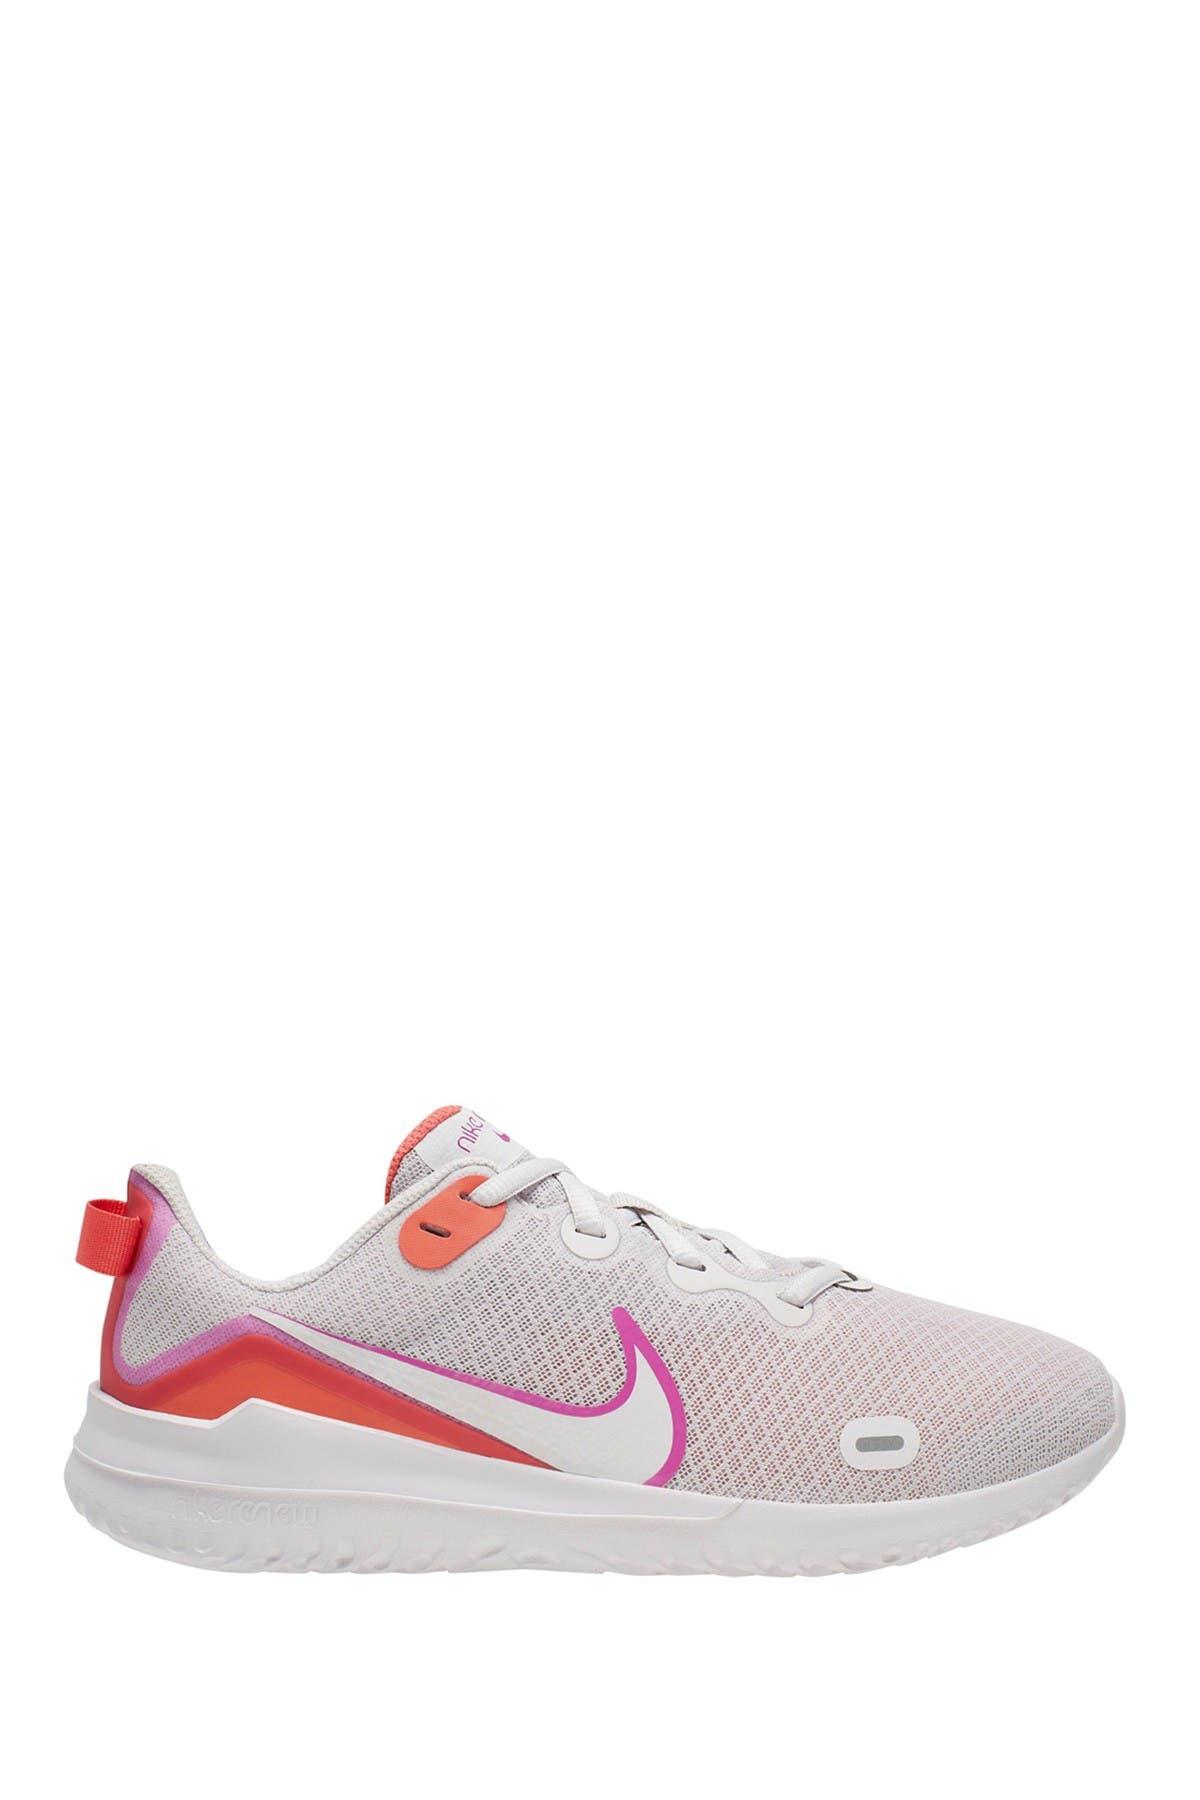 Nike | Renew Running Shoe | Nordstrom Rack